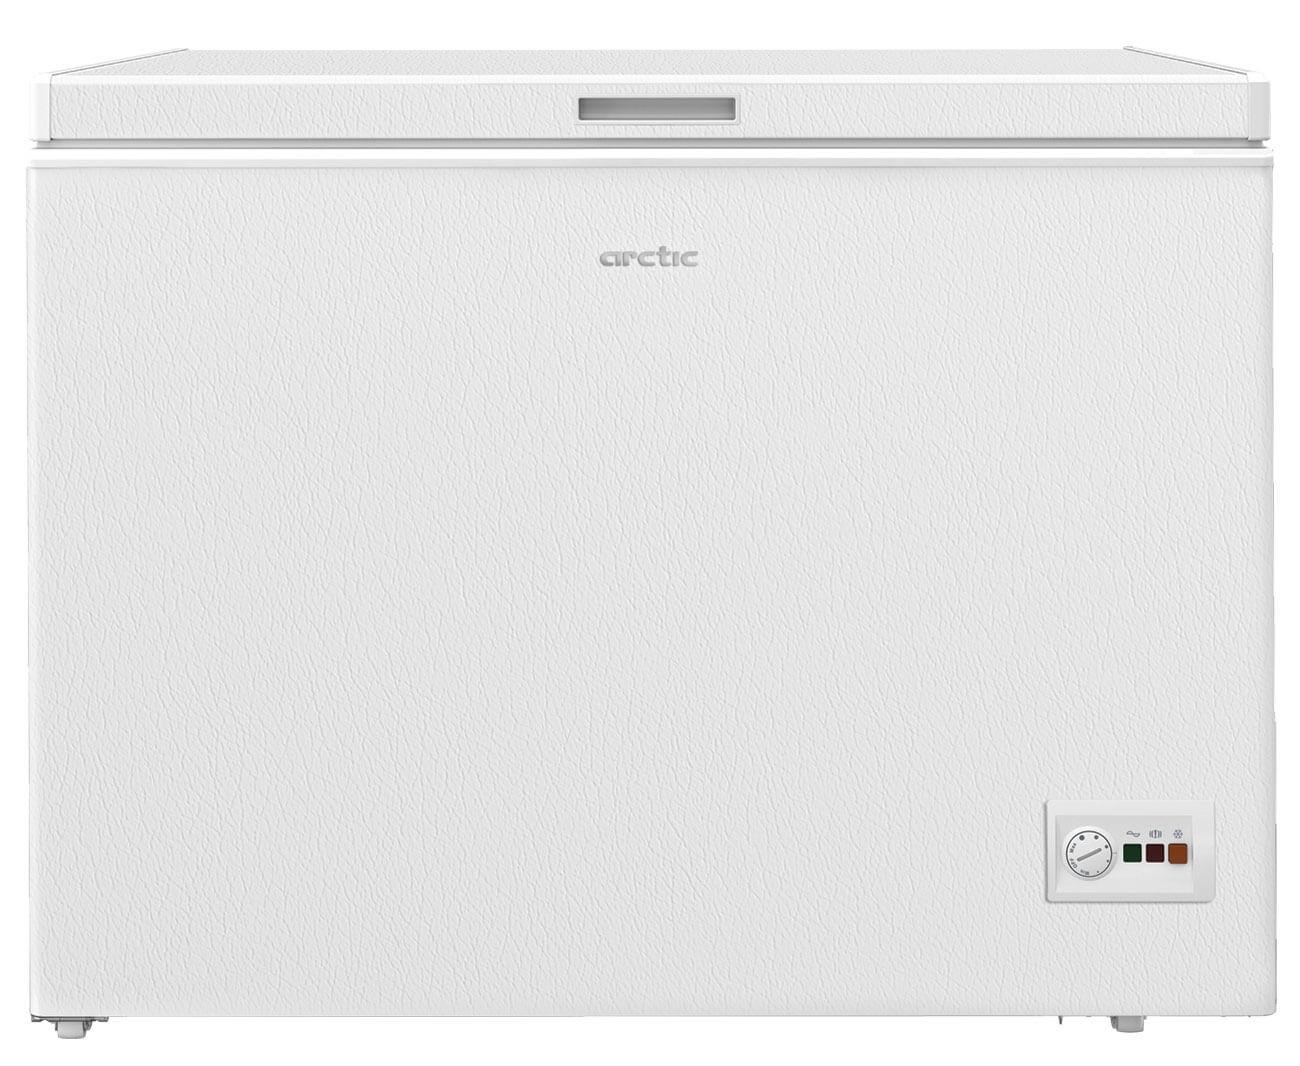 Lada frigorifica Arctic AO23P40